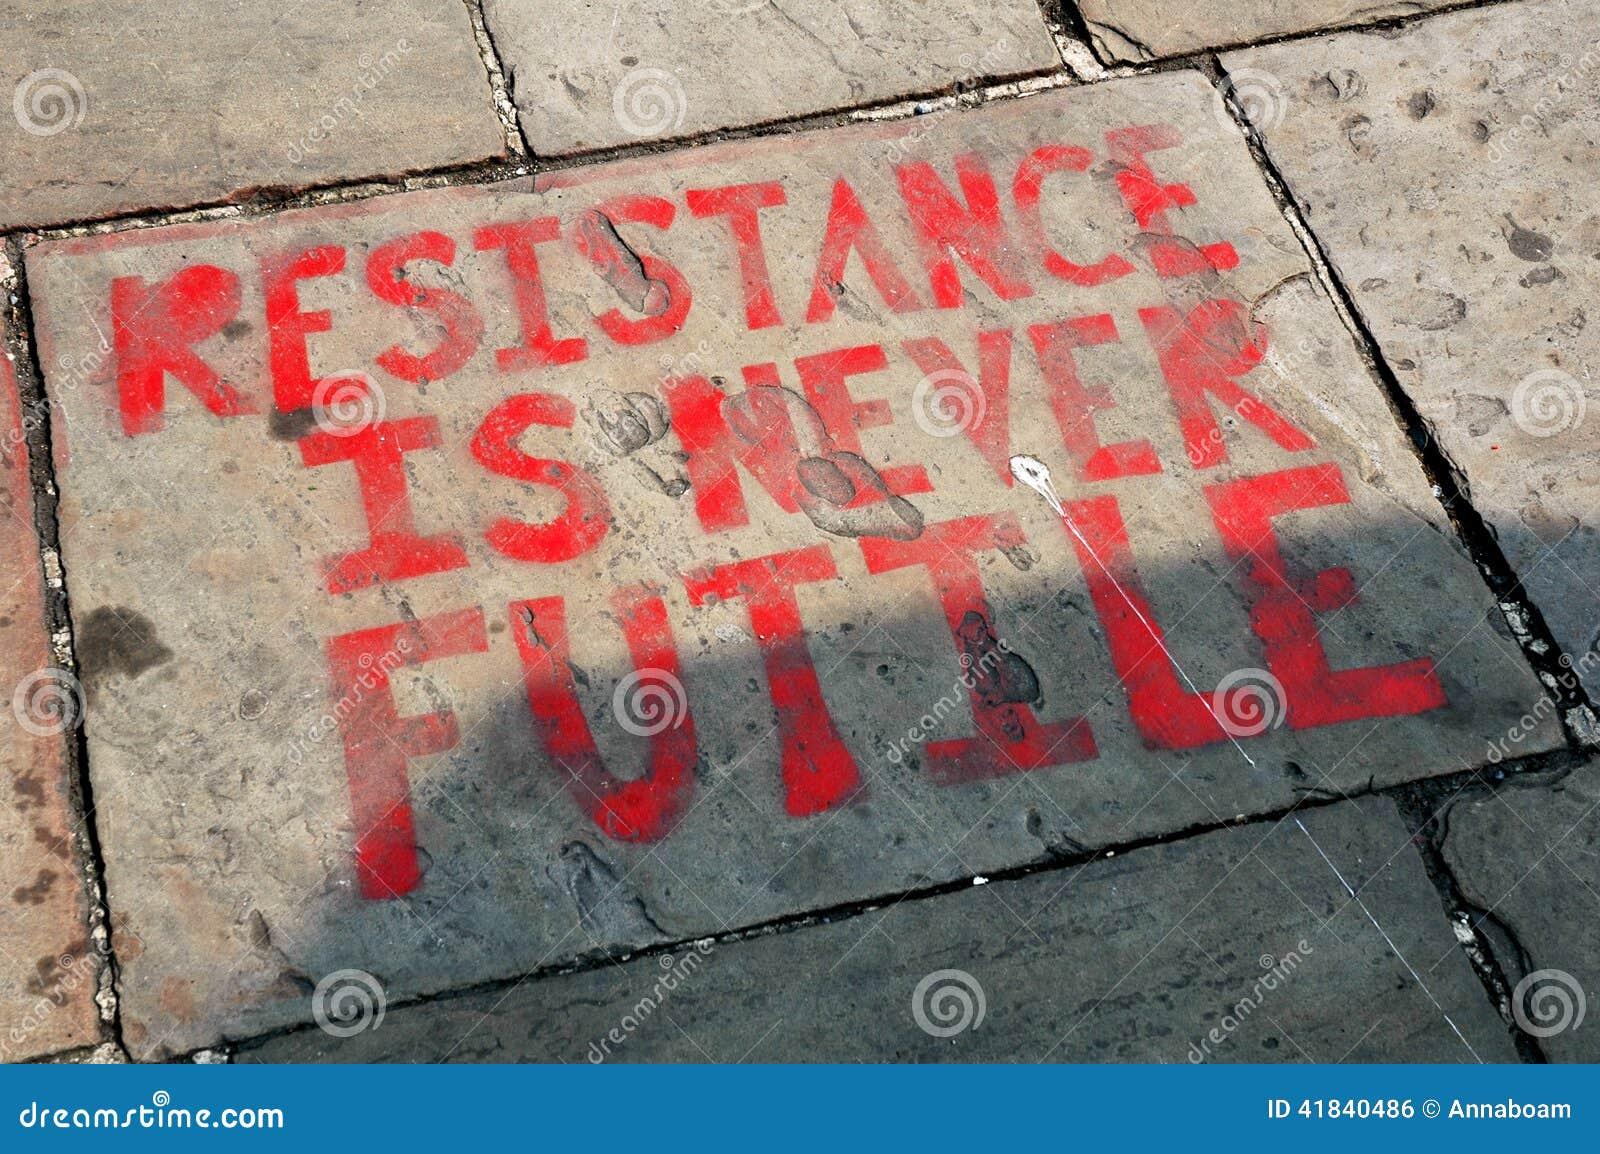 Graffiti text resistance is never futile